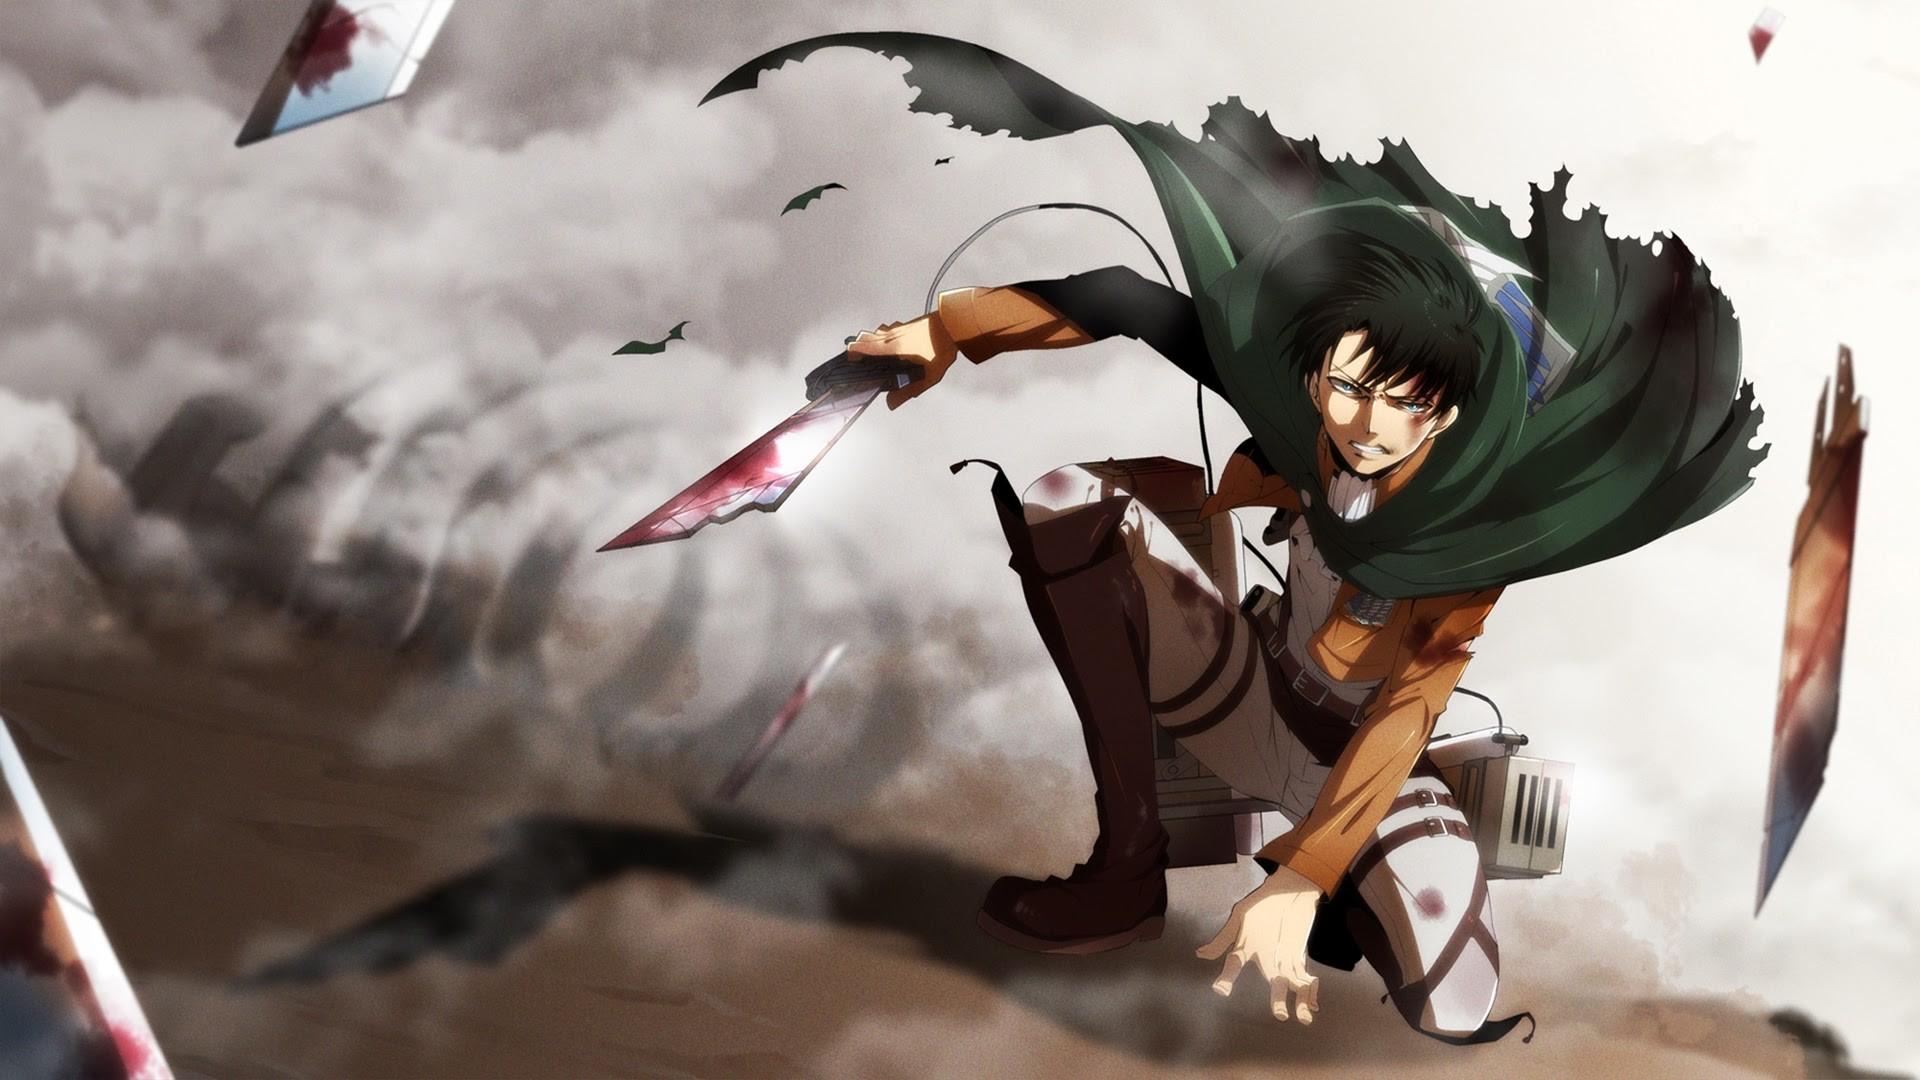 Levi Attack on Titan 6d Wallpaper HD